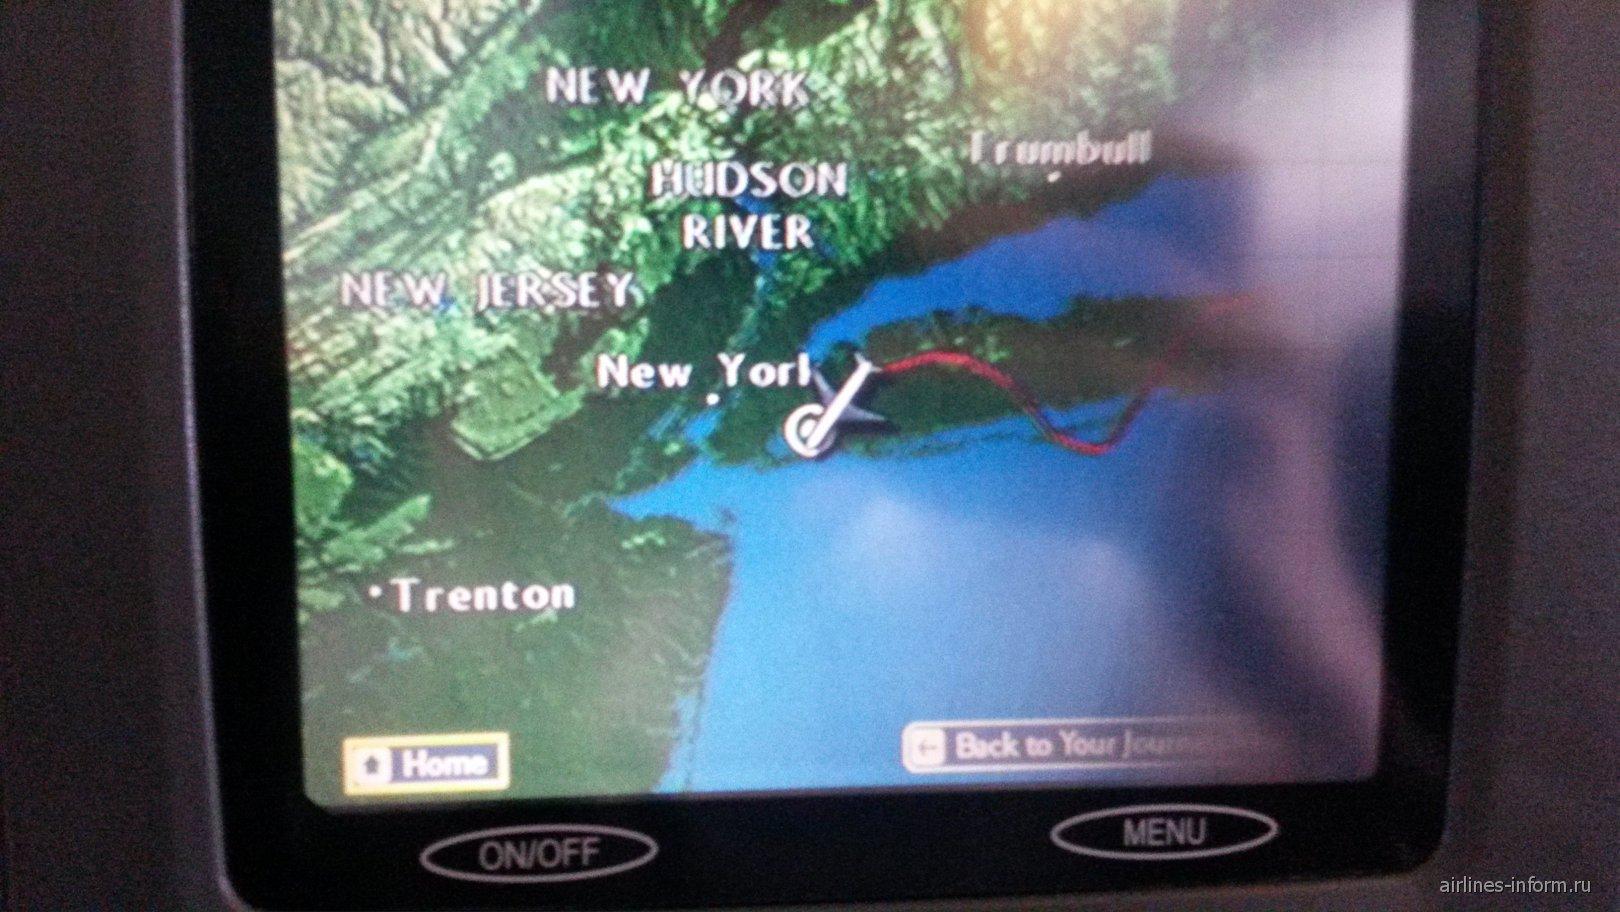 Онлайн-карта полета Лондон-Нью-Йорк Британских авиалиний